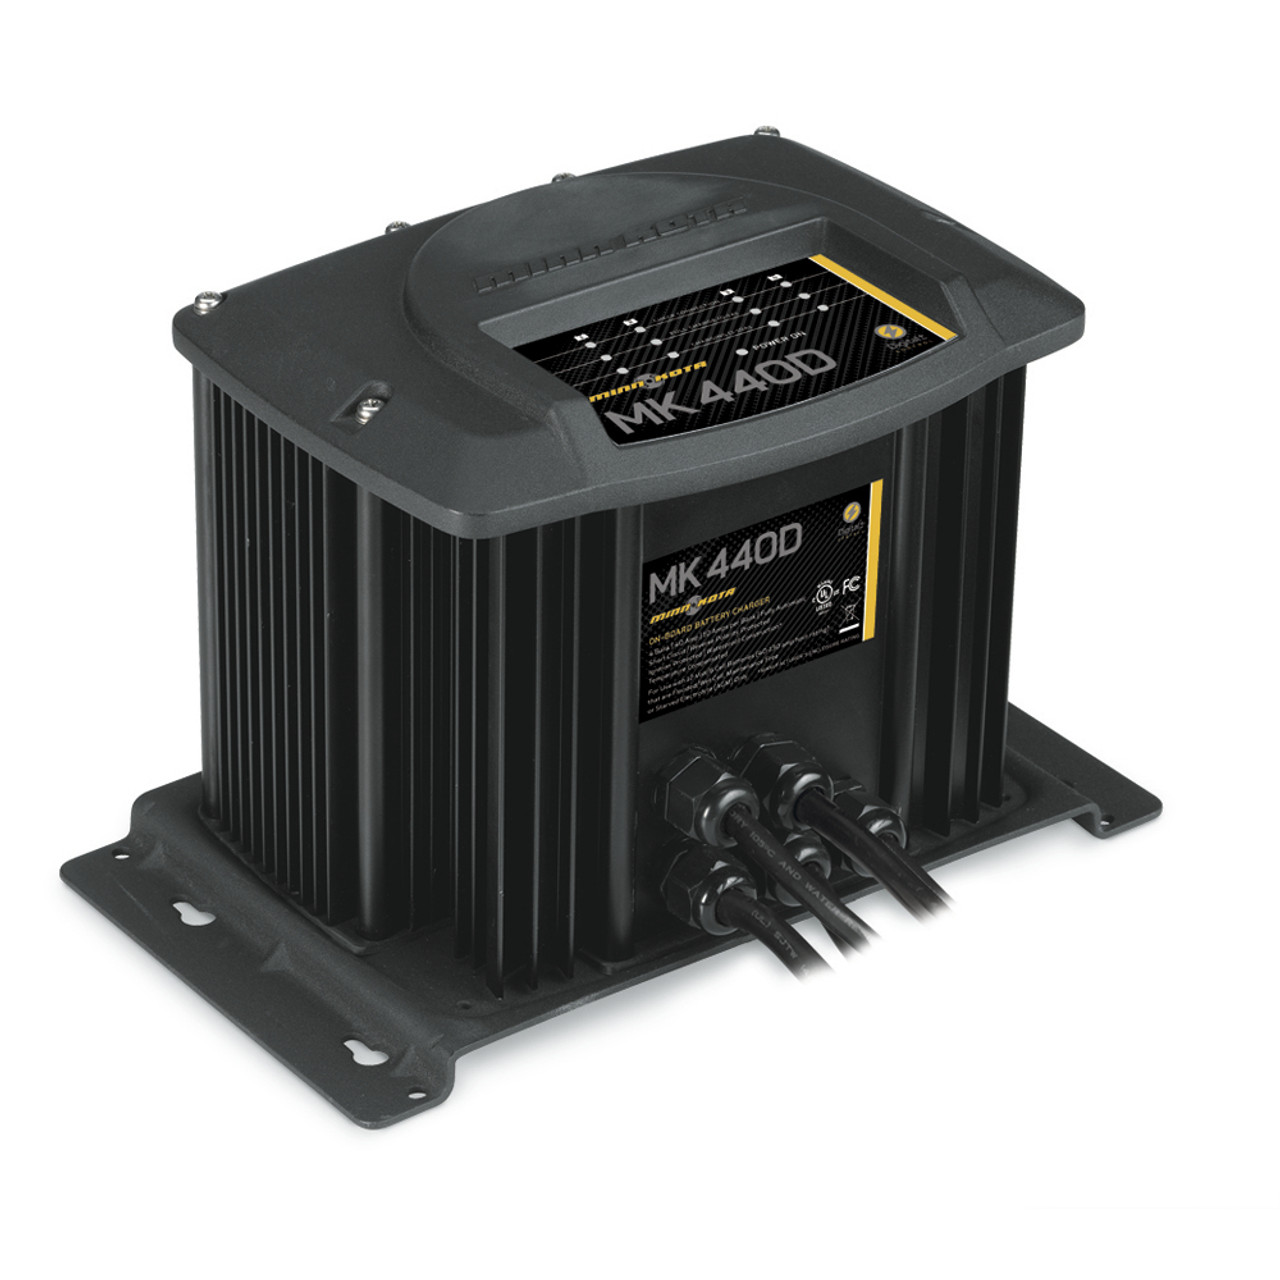 Minn Kota Boat Marine MK-BC-1 Battery Connectors Fits post-type battery terminal